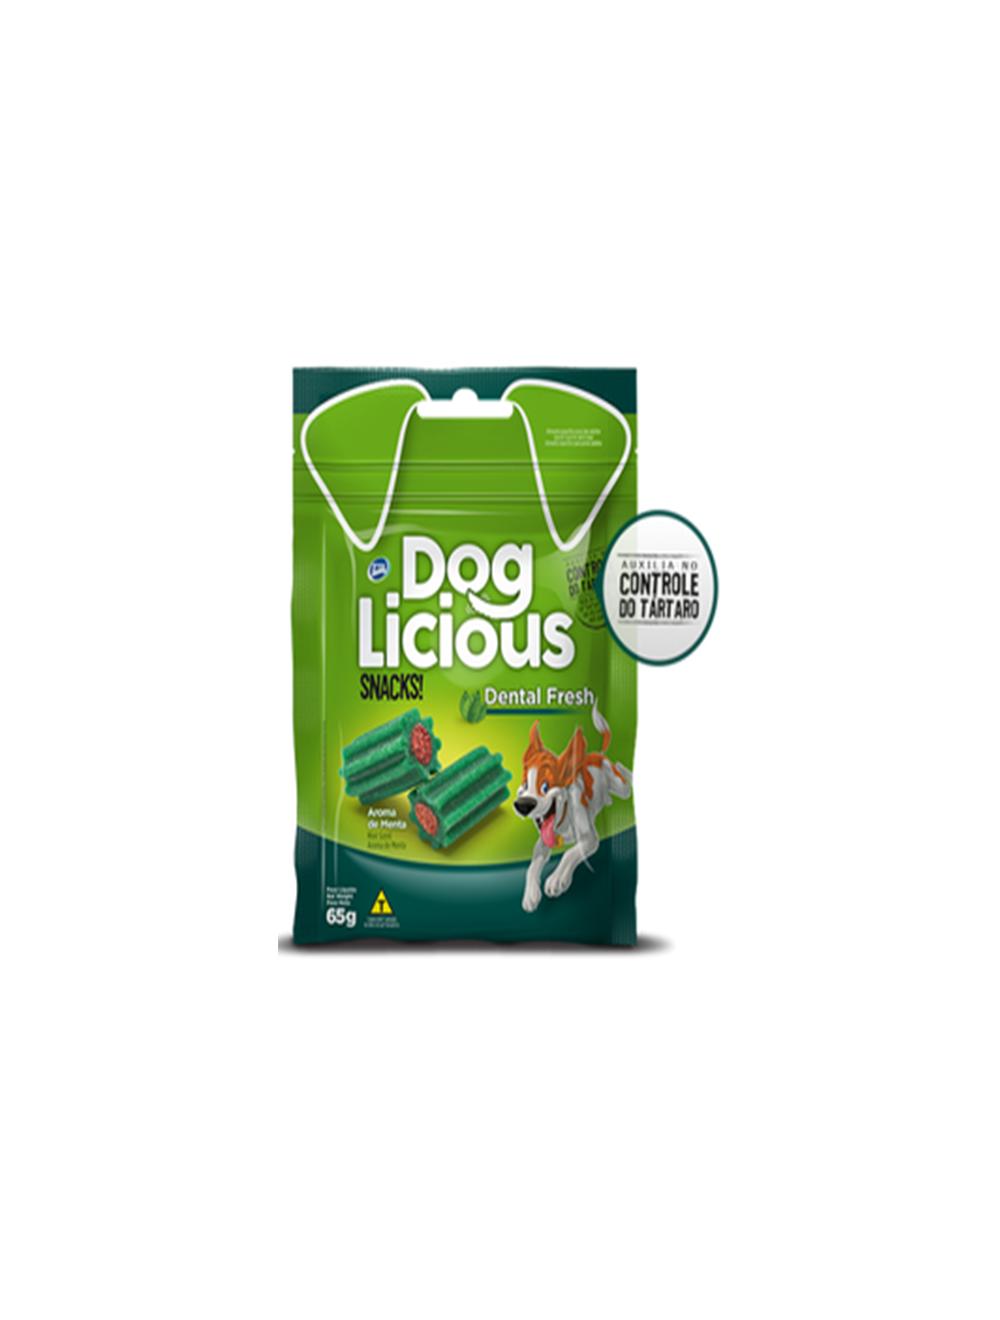 Dog Licious Snack Para Perros Dental Fresh 65g